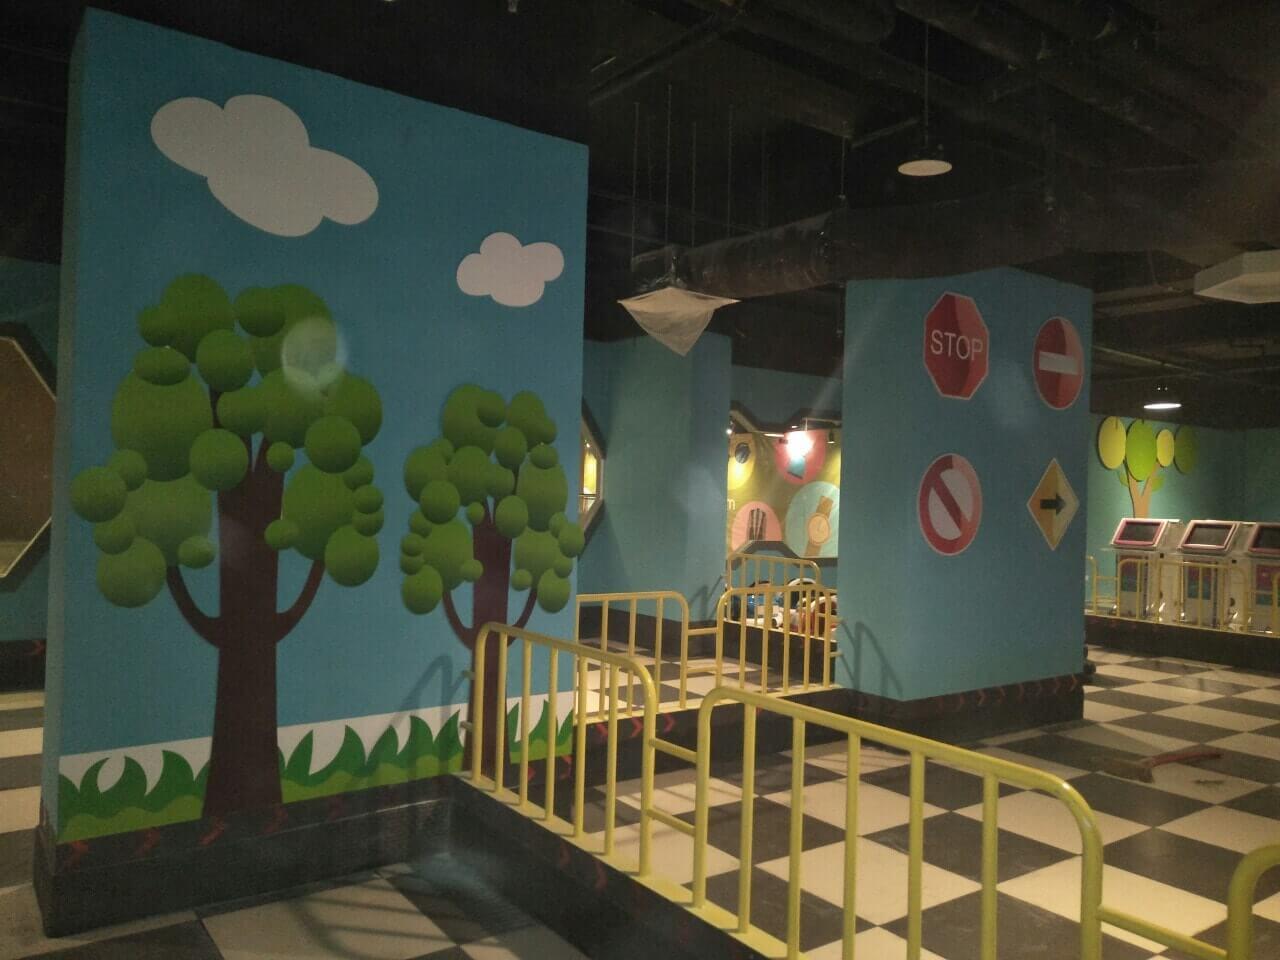 GOADESIGN Thiết Kế Khu Vui Chơi Garden Mall - Q5 (12)